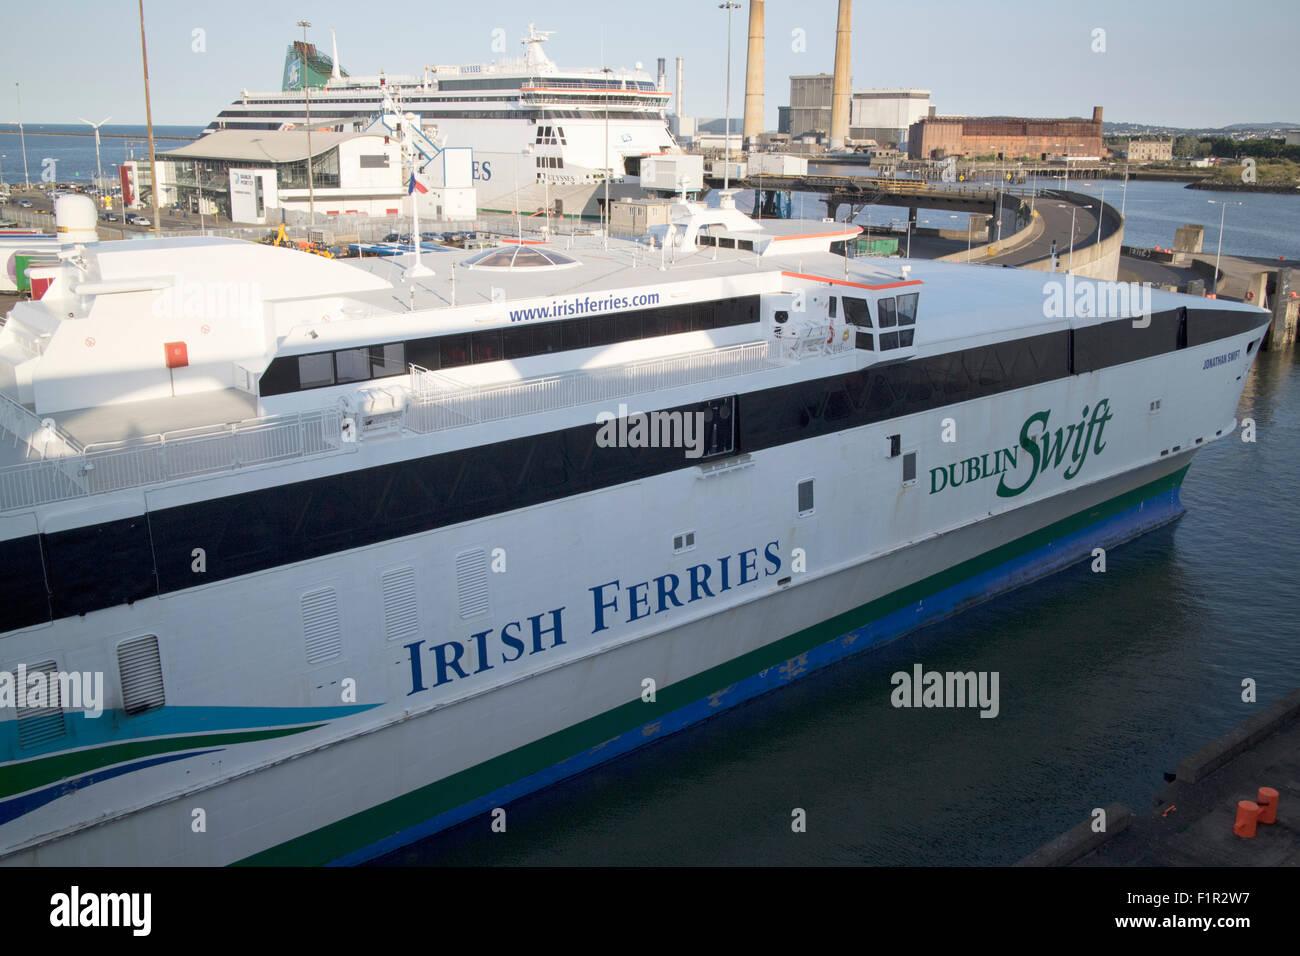 irish ferries ferry port with jonathan swift fast ferry dublin port republic of Ireland - Stock Image